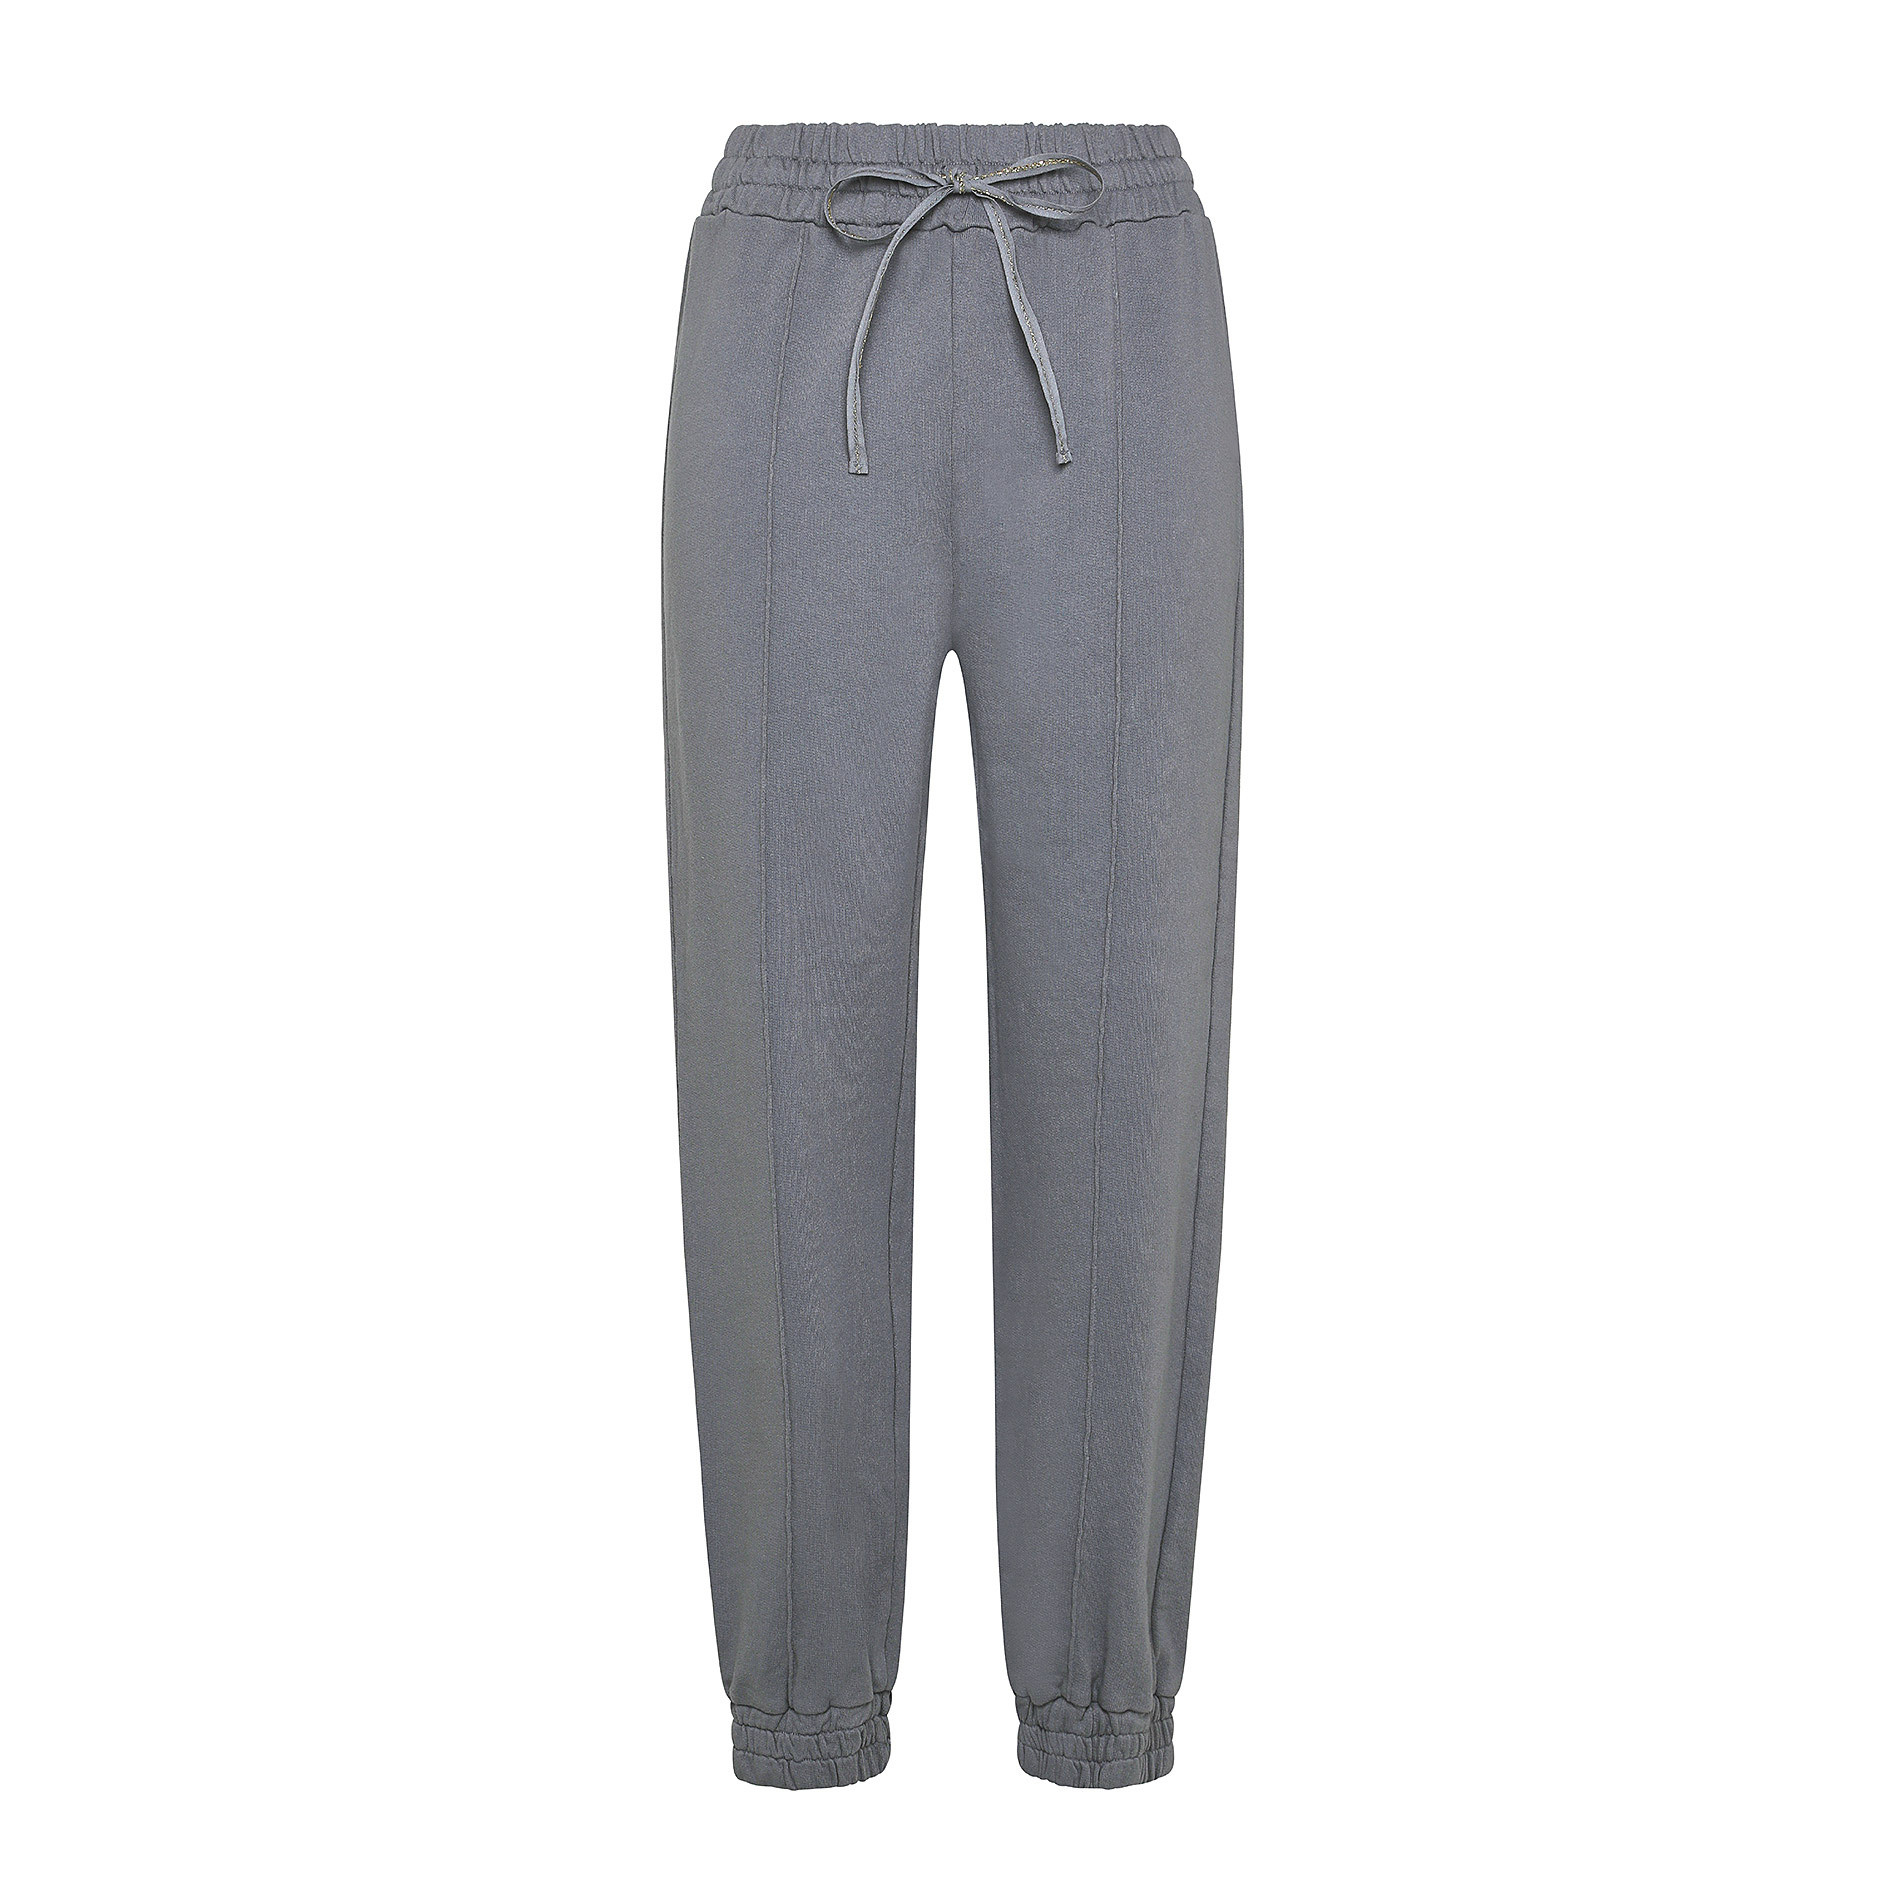 Pantalone felpa cotone biologico Koan, Grigio scuro, large image number 0